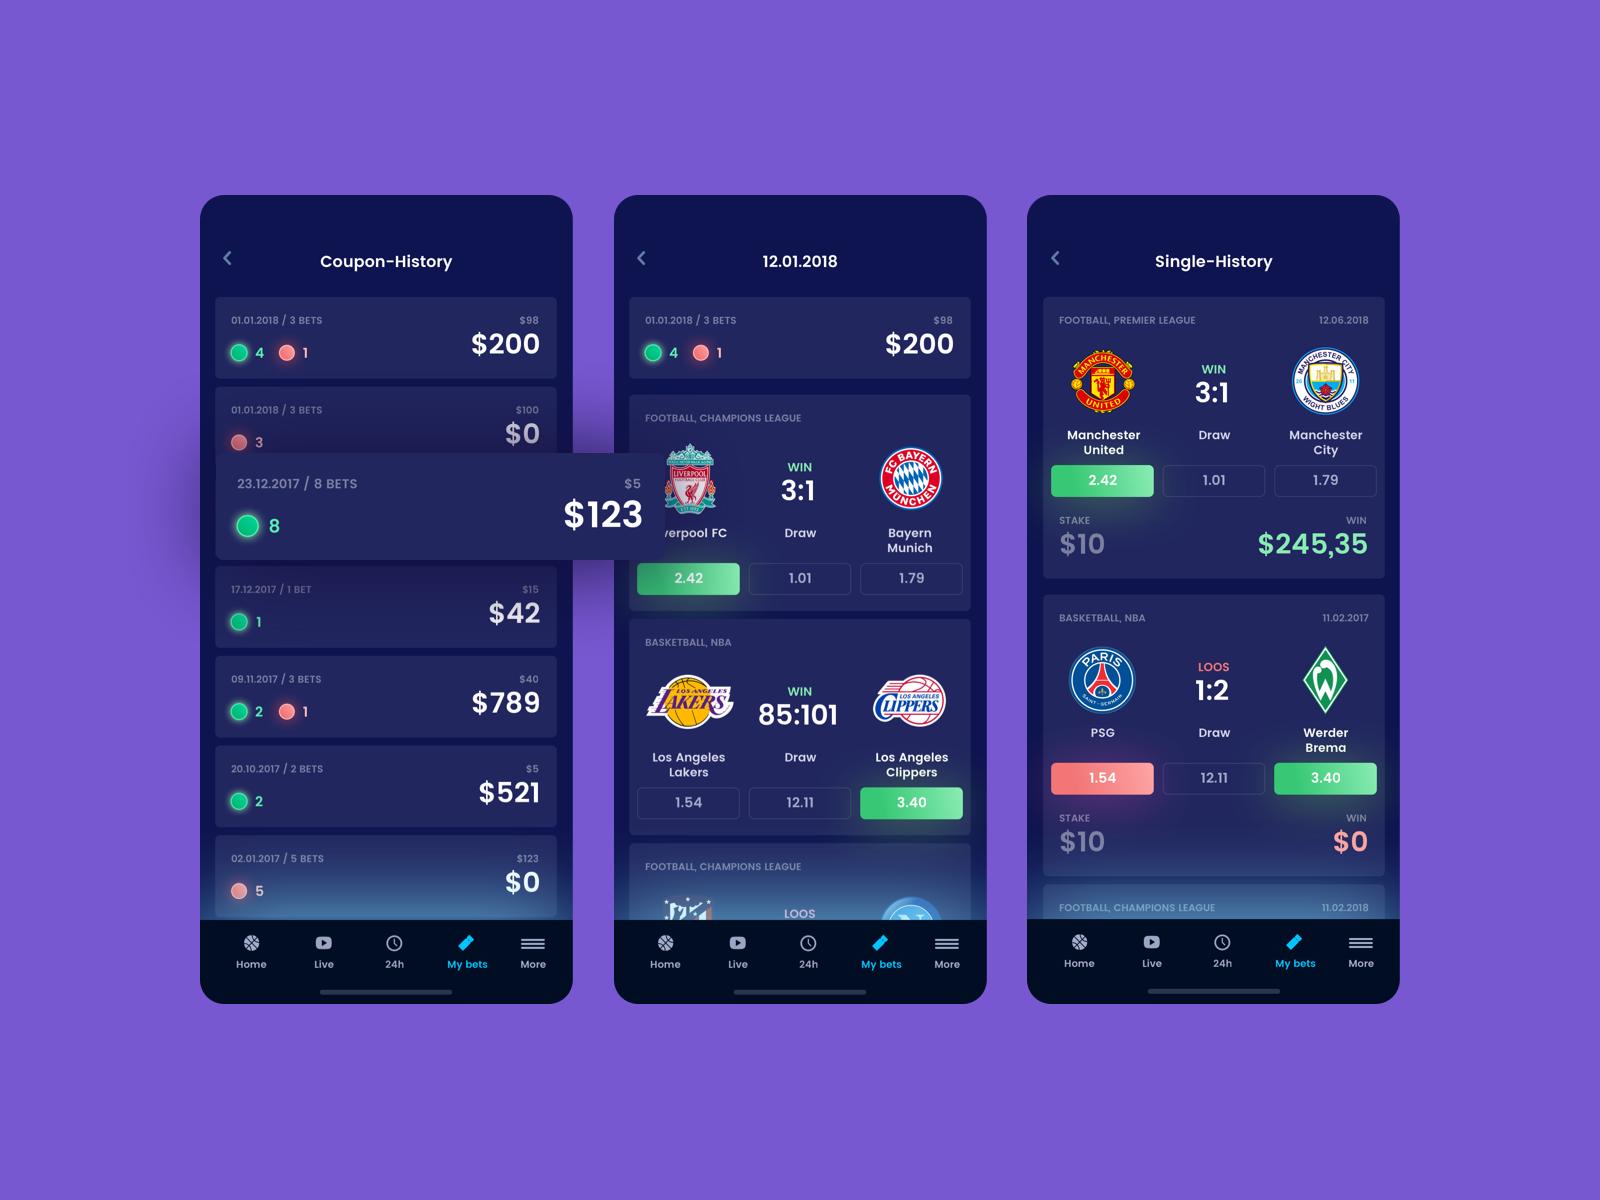 Khelo 24 bet app